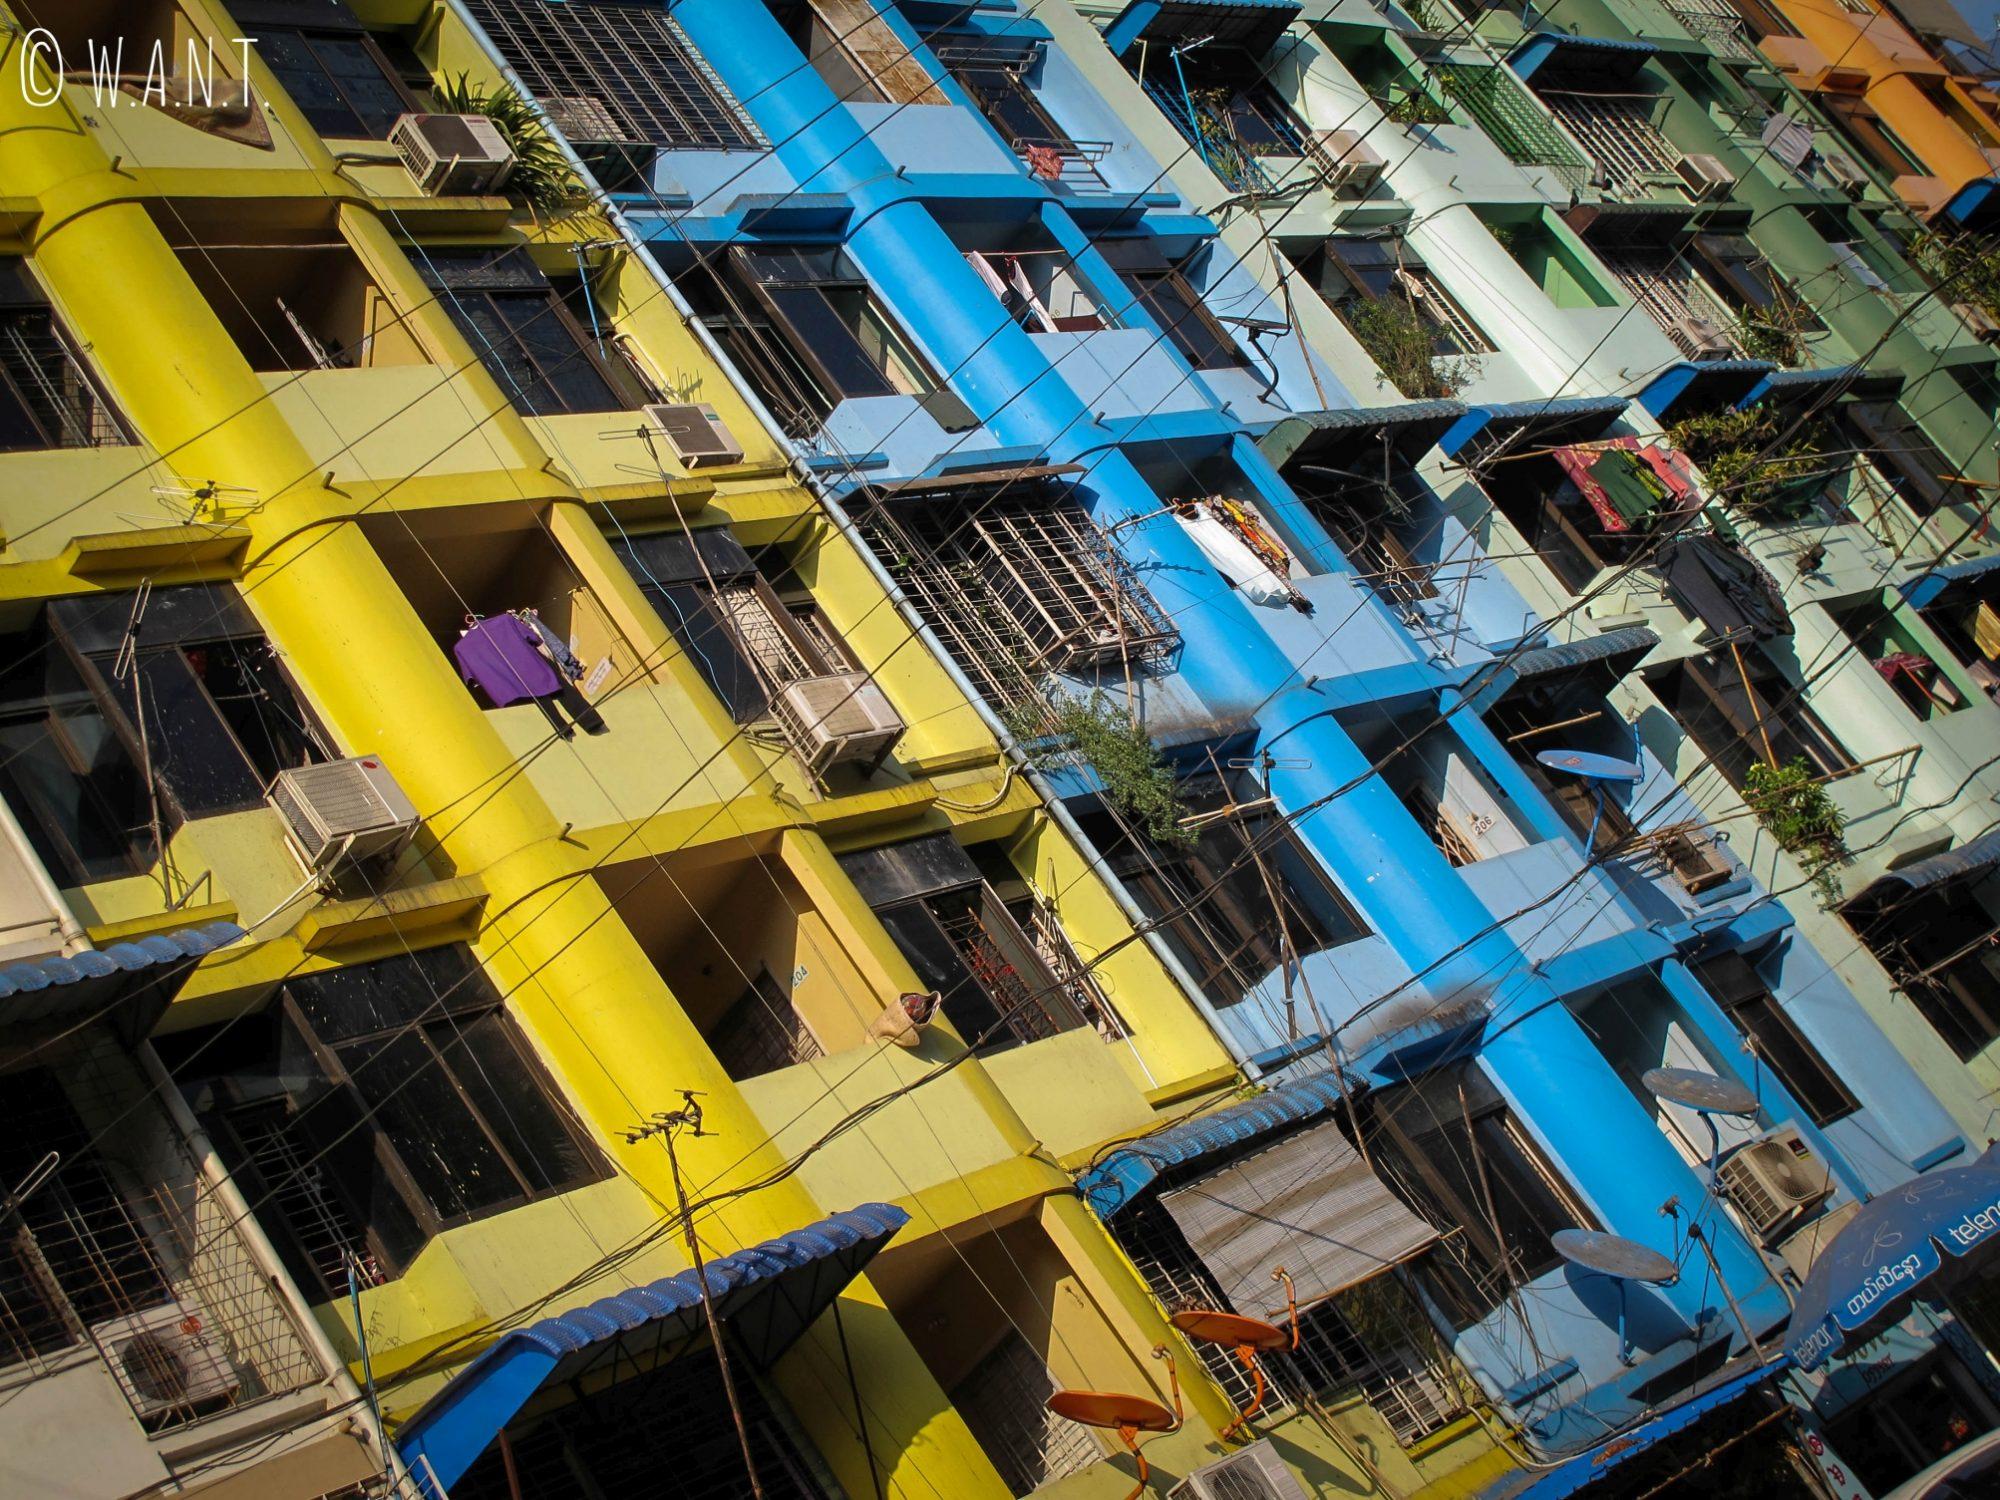 Façades colorées dans les rues de Yangon